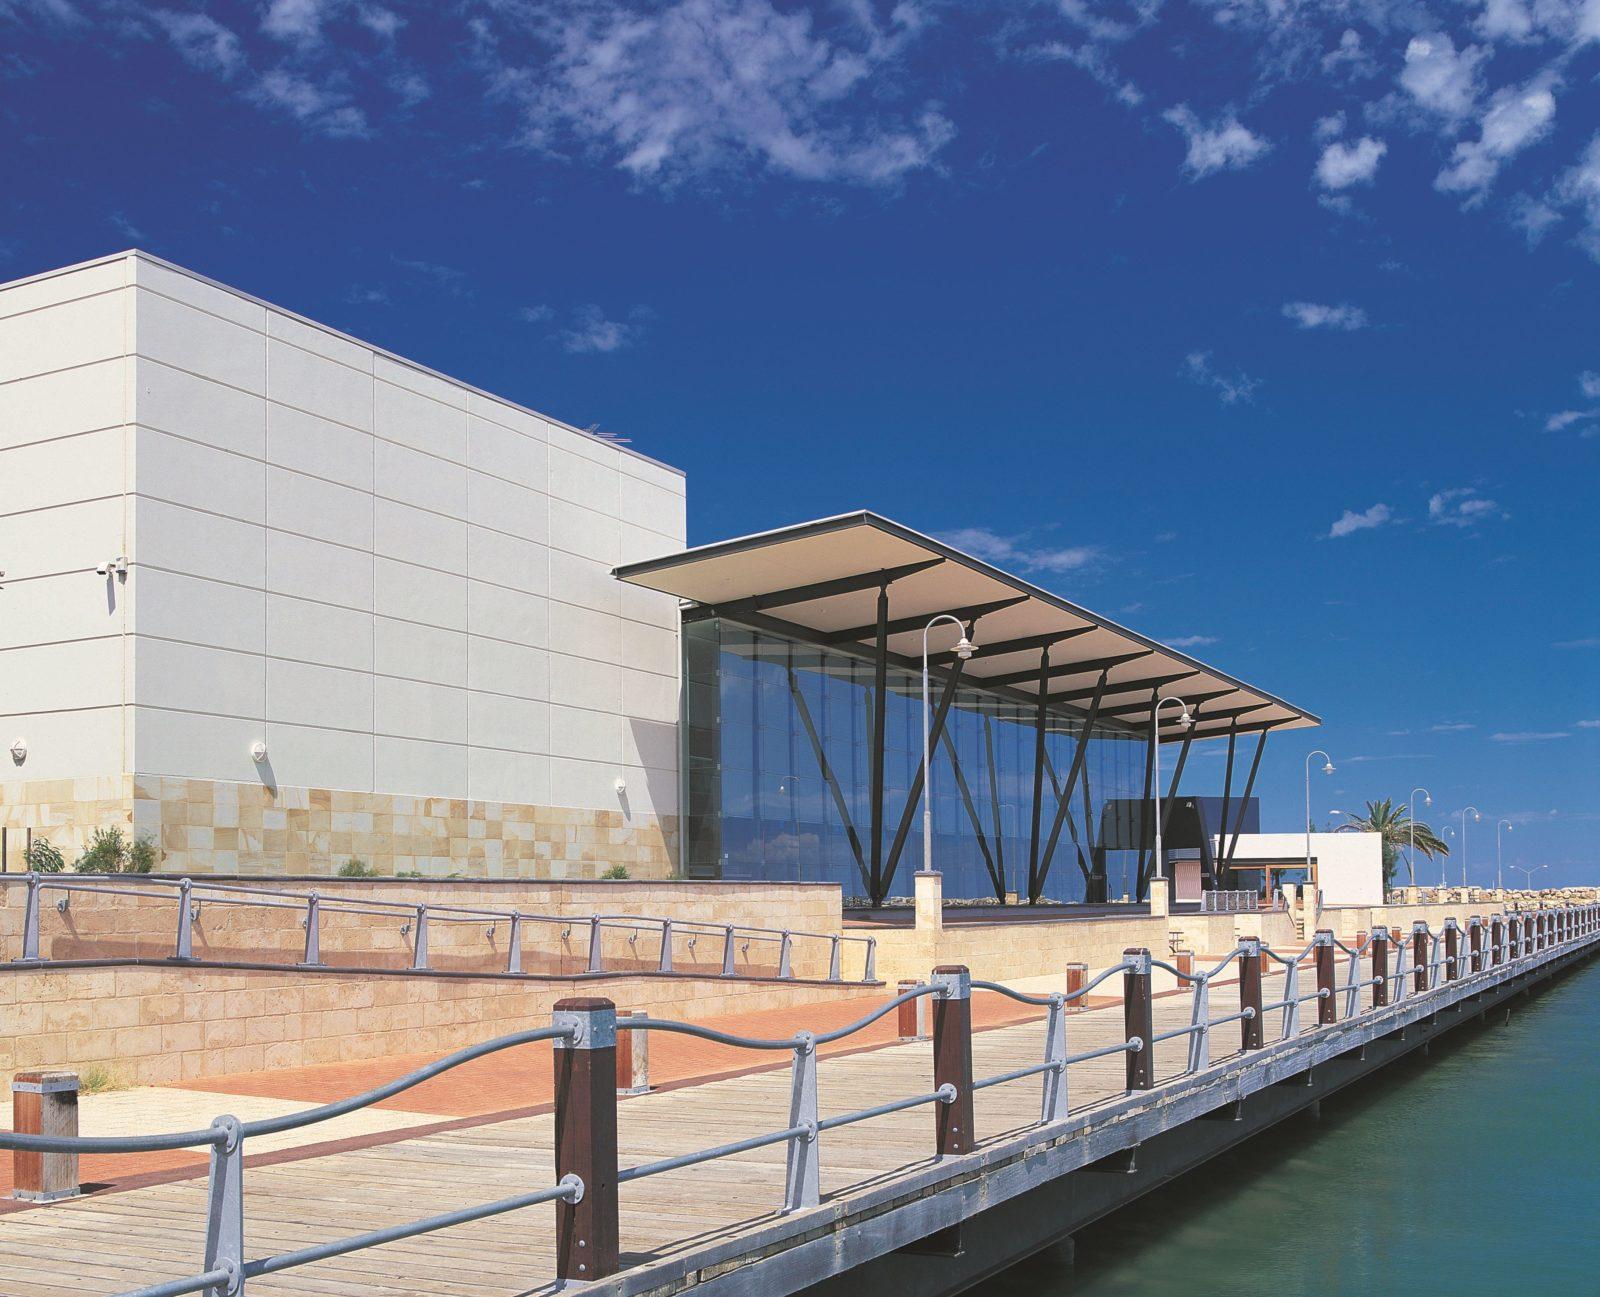 Western Australian Museum, Geraldton, Western Australia